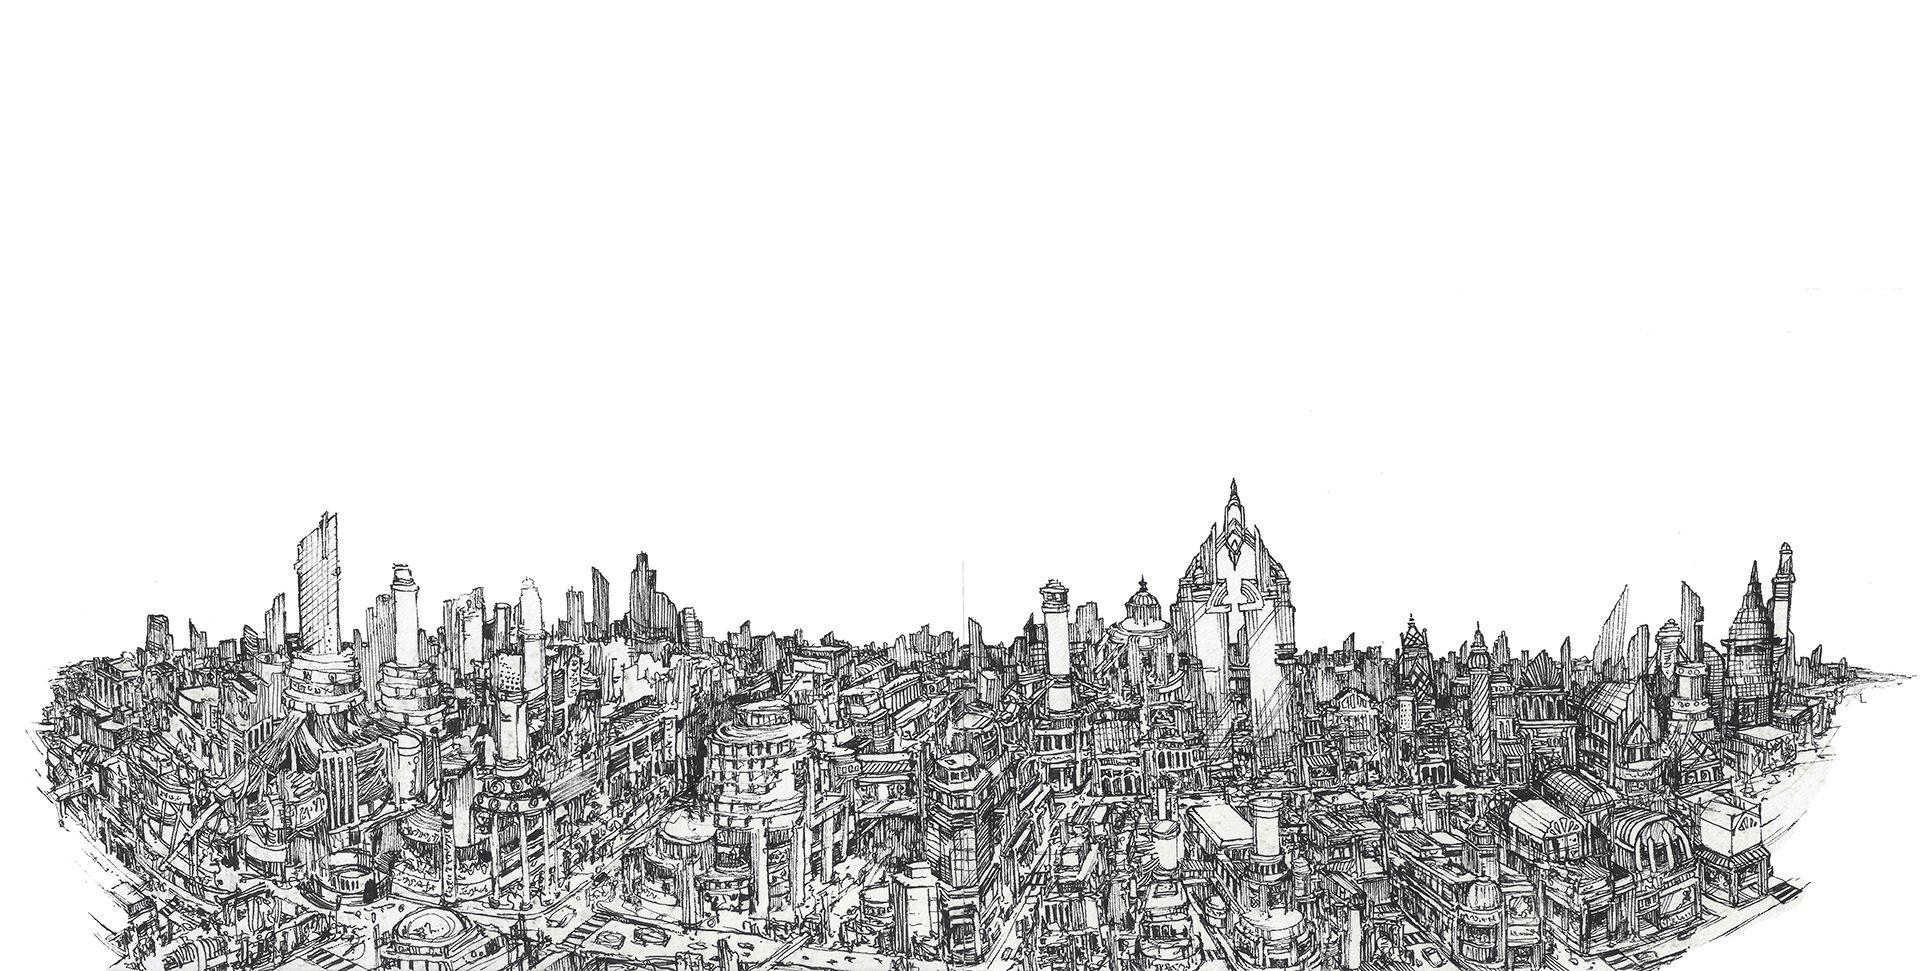 city_both_pen_600_1080p.jpg